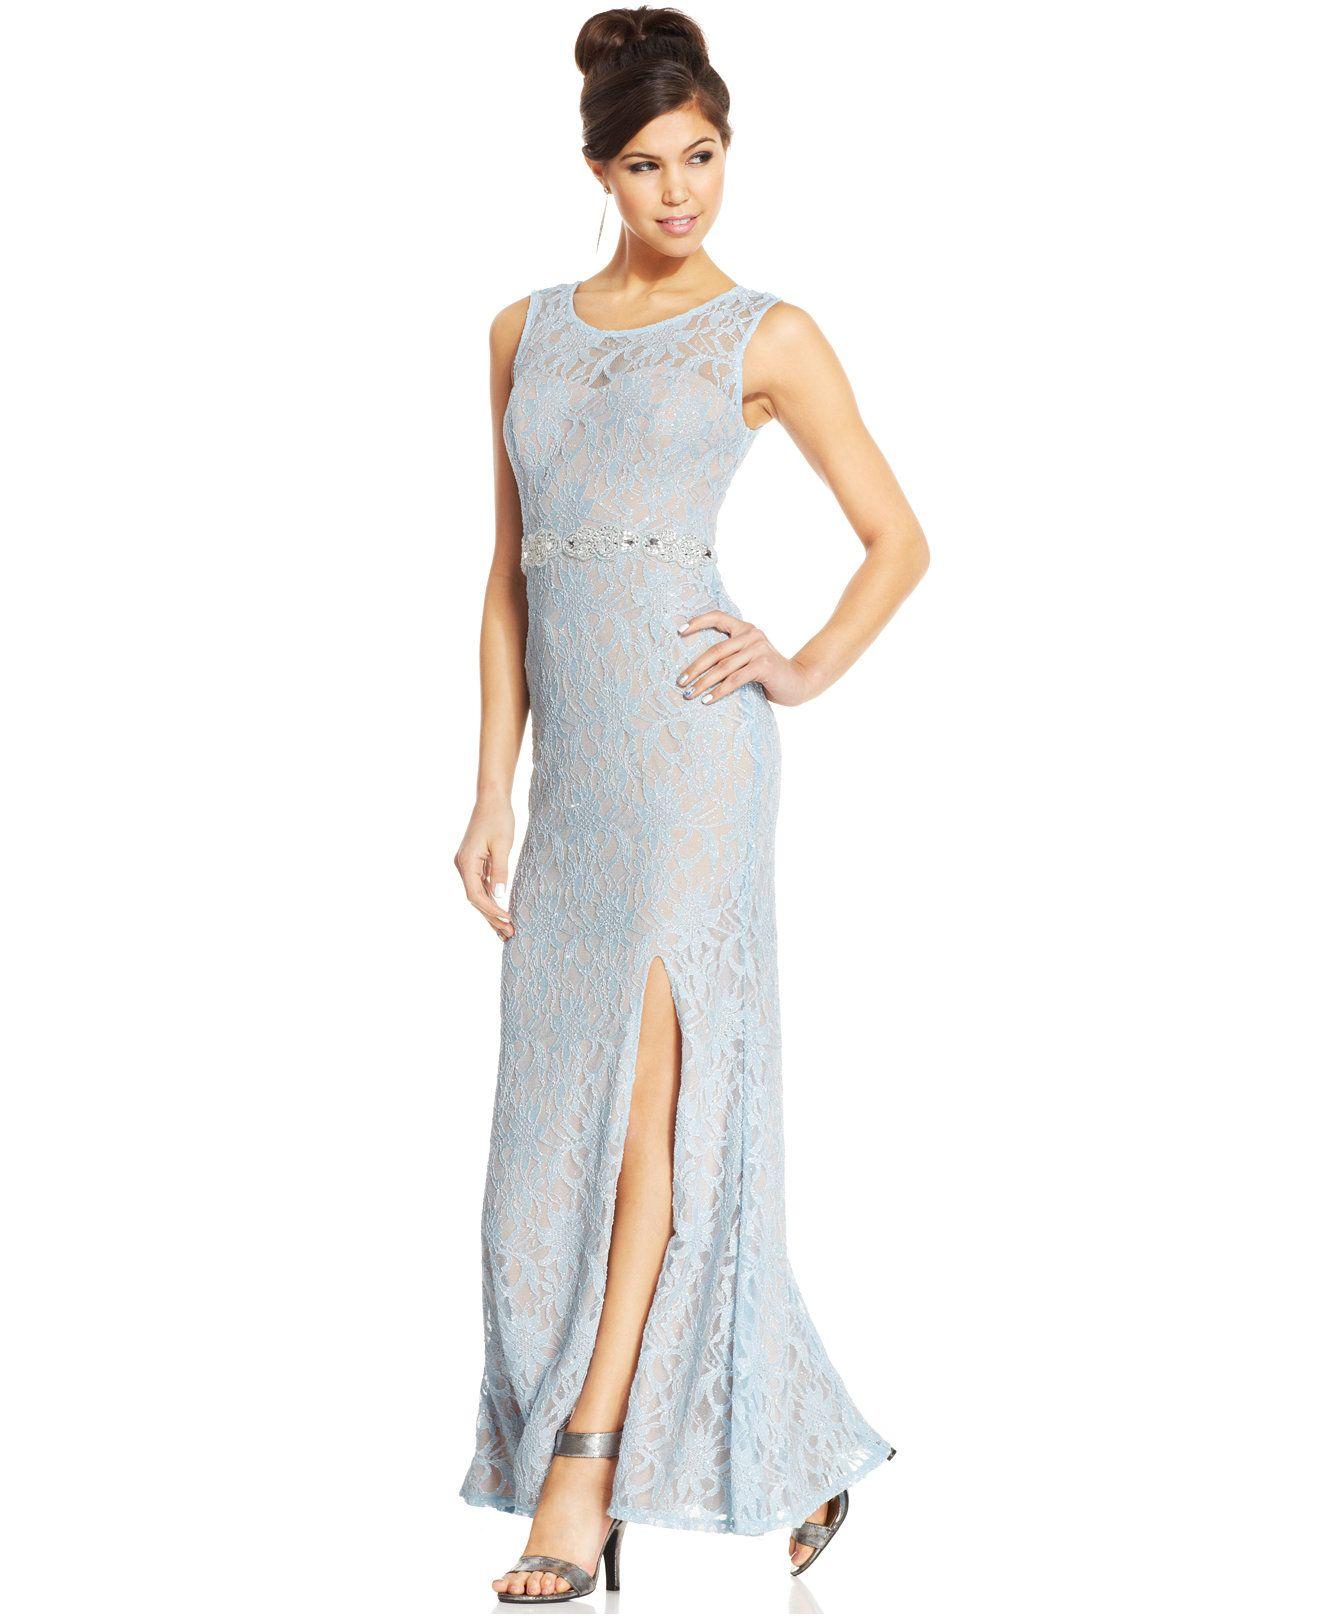 City Studios Juniors\' Lace Back-Cutout Dress - Juniors Shop All Prom ...